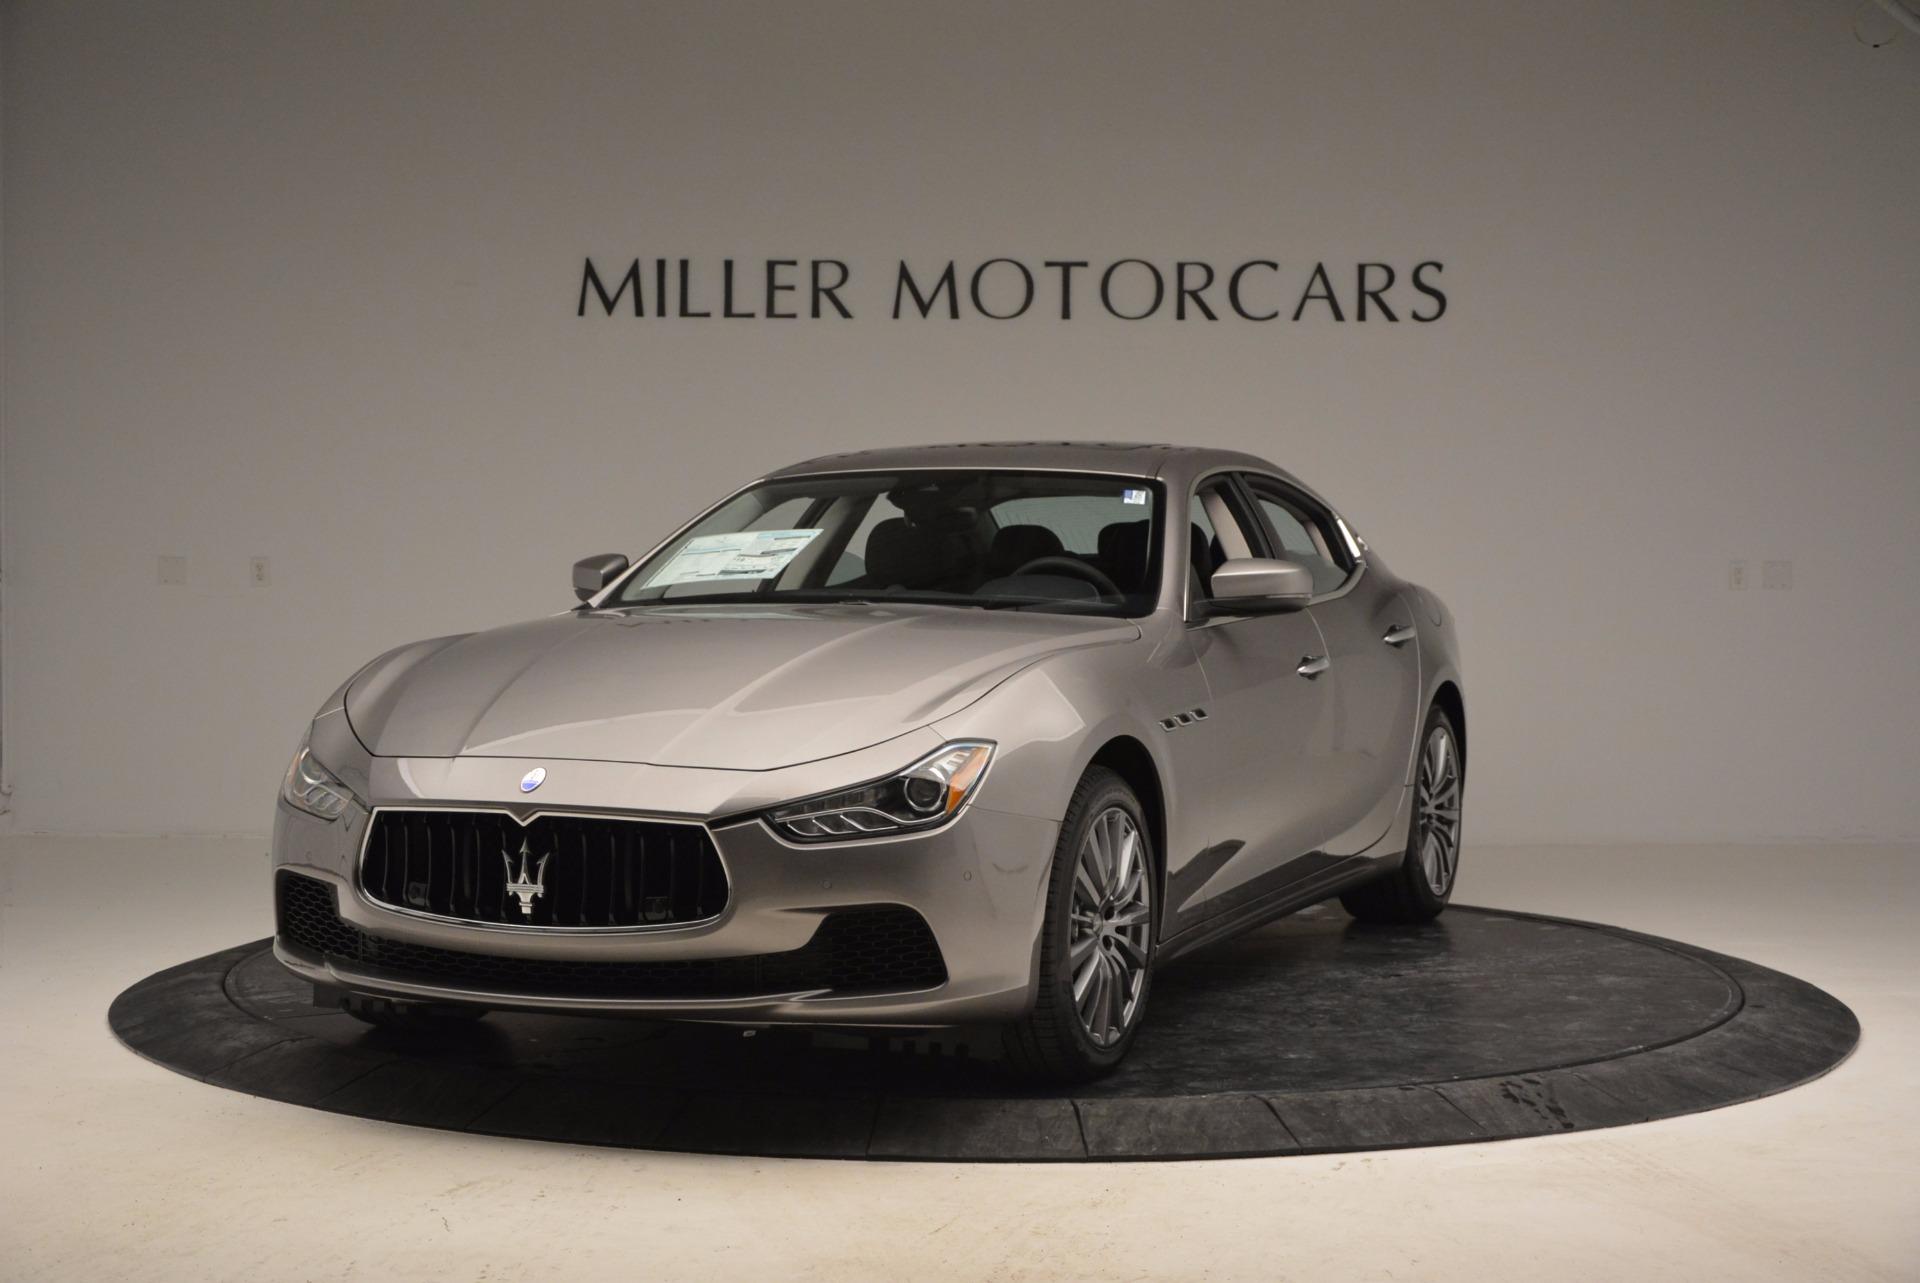 New 2017 Maserati Ghibli S Q4 For Sale In Greenwich, CT 872_main